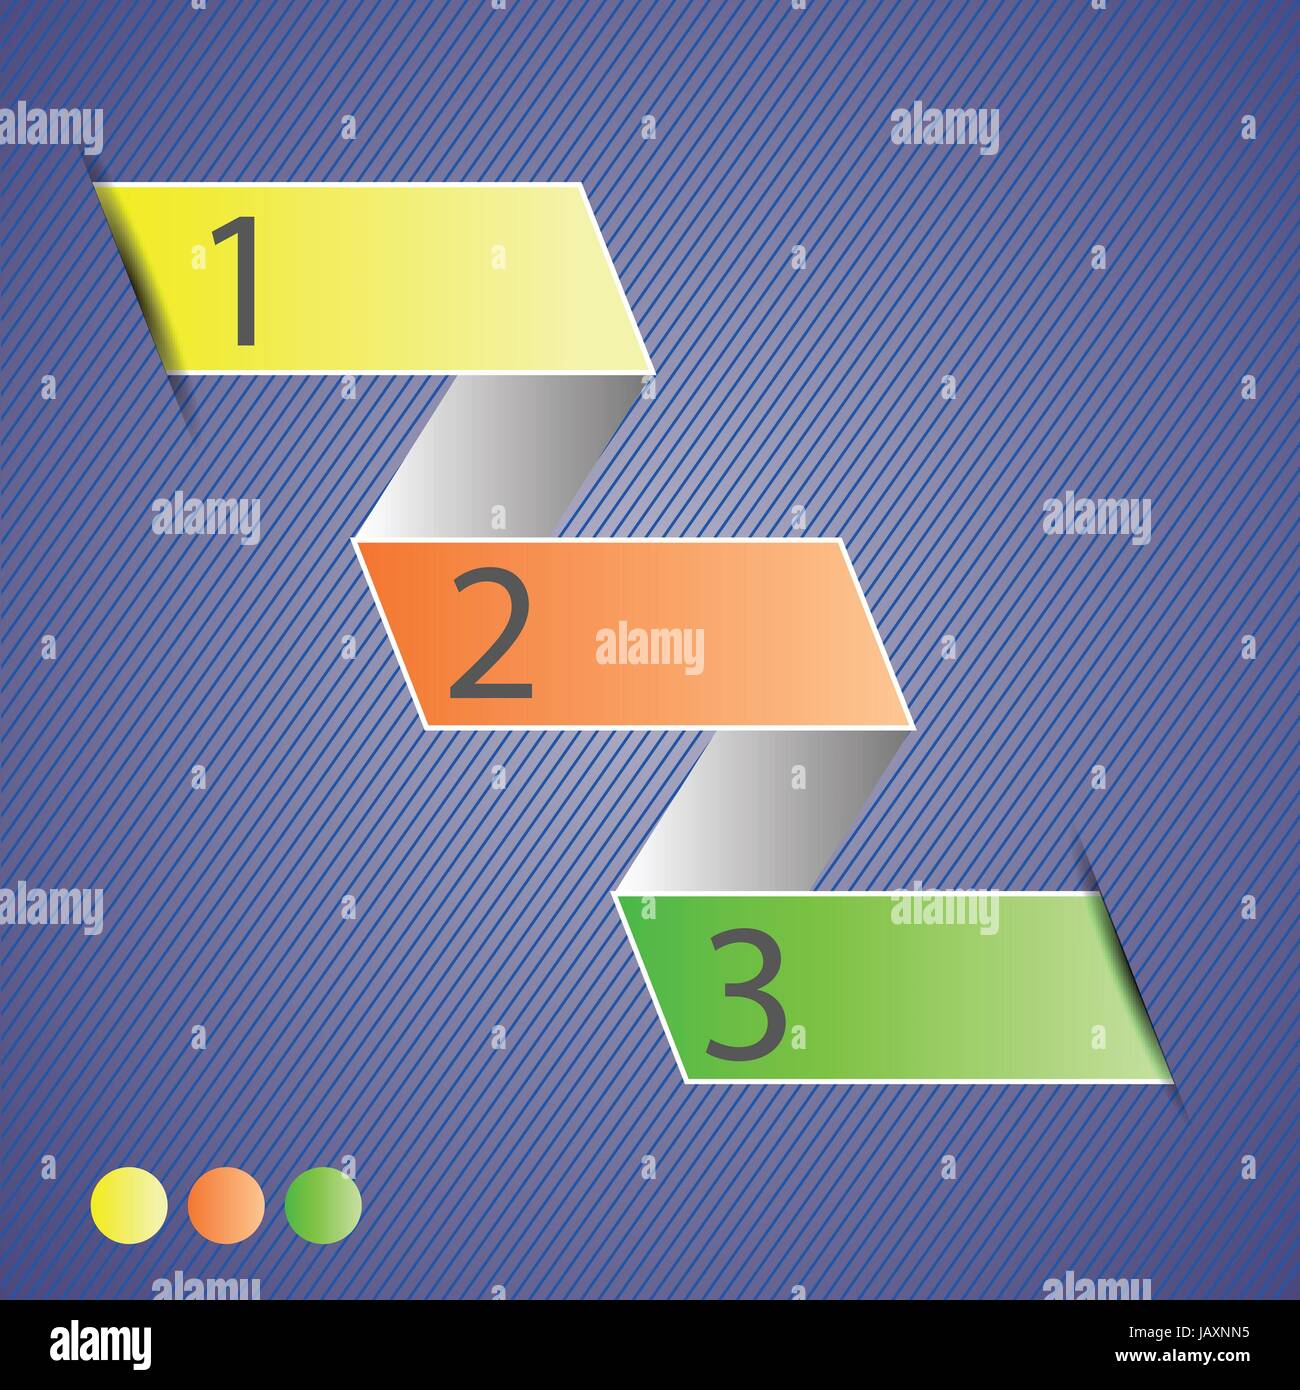 Infographic Style Stockfotos & Infographic Style Bilder - Alamy